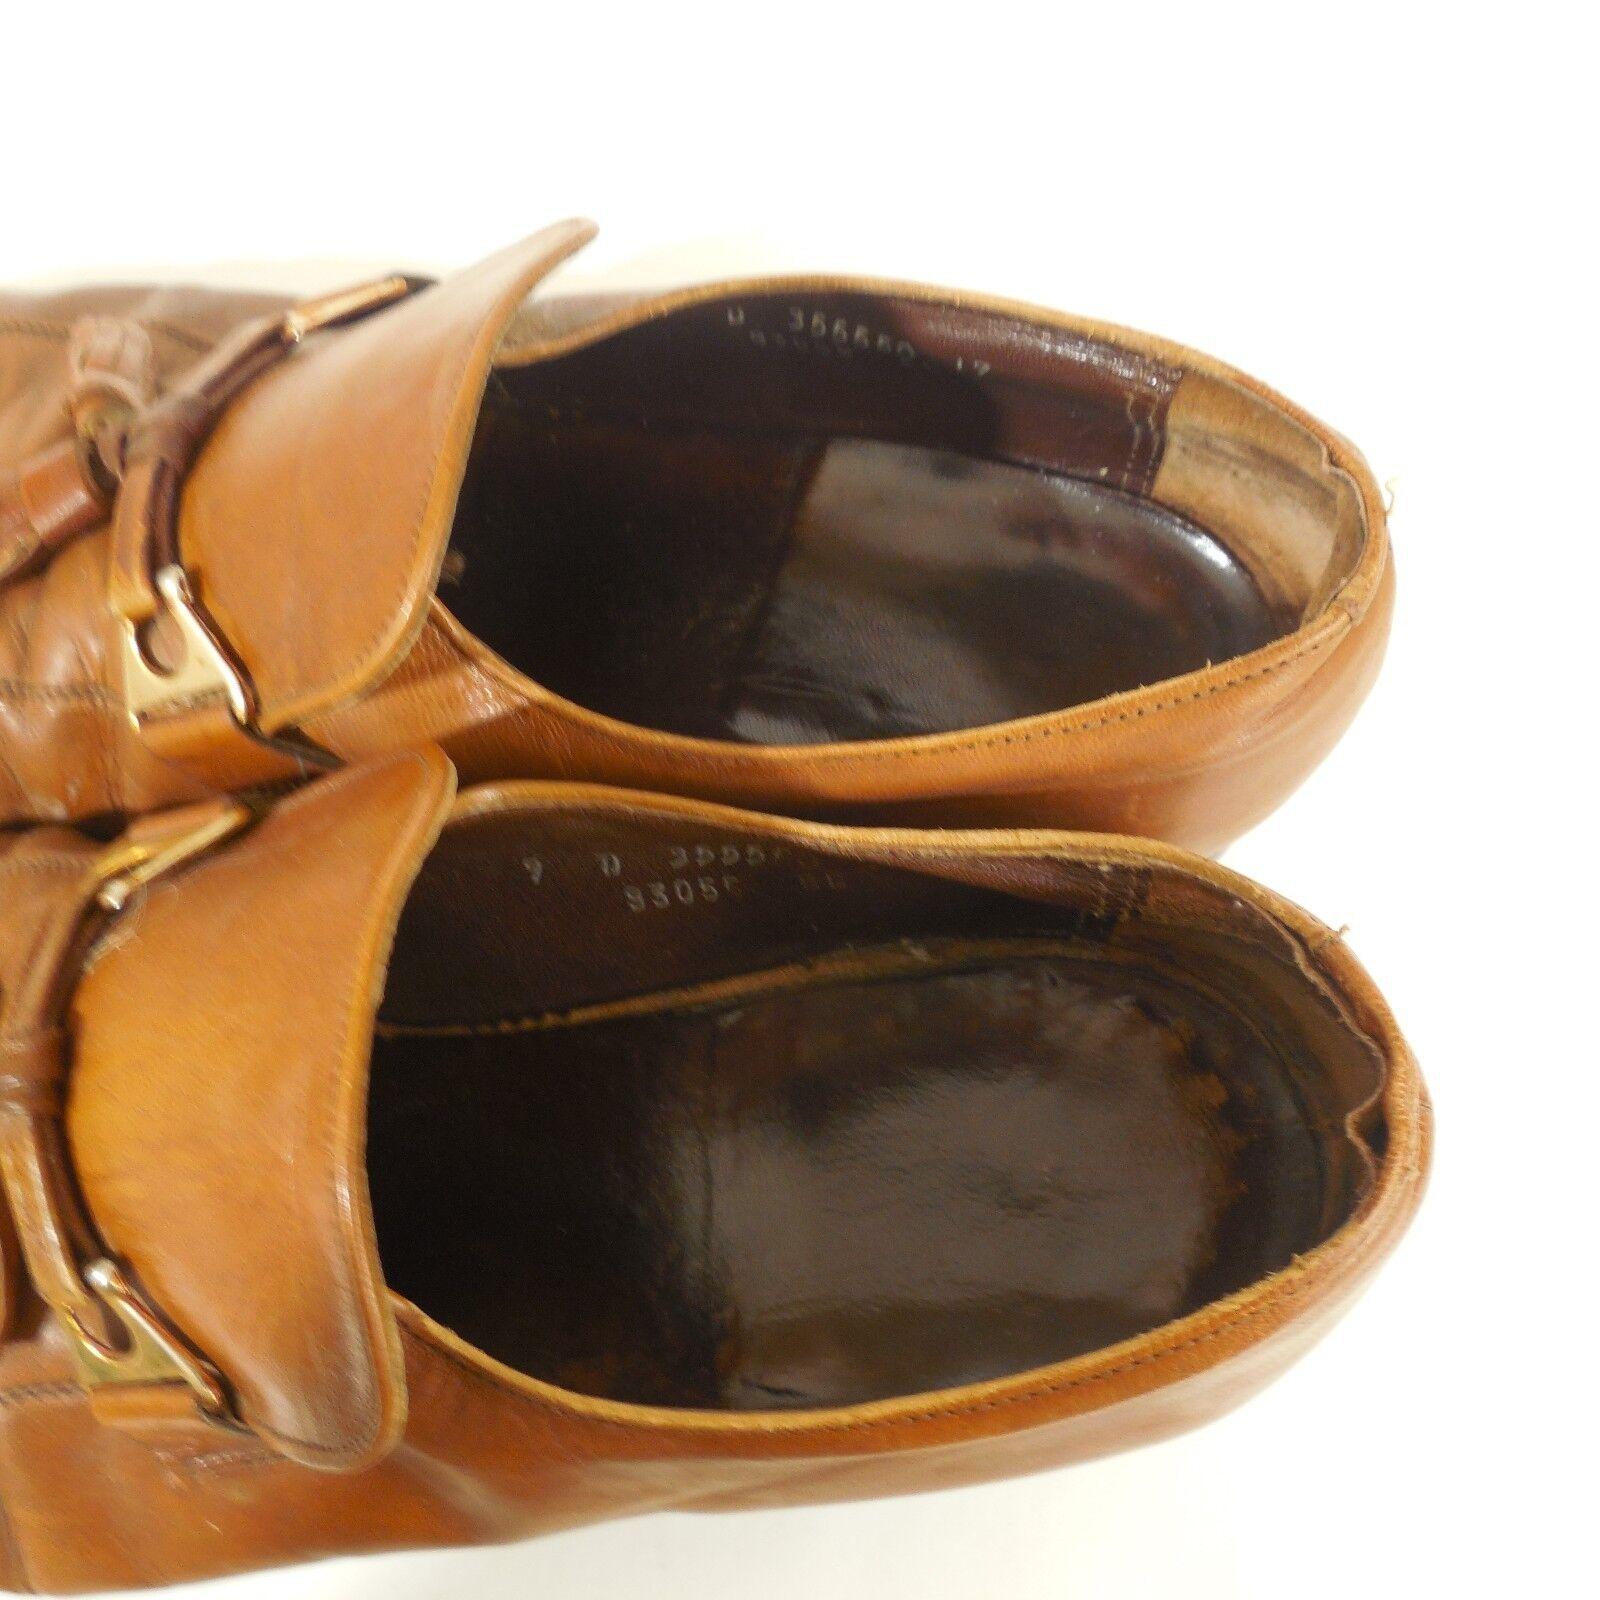 Florsheim Florsheim Florsheim Royal Imperial Mens Sz 9 D braun Tassel Leather Dress schuhe Preowned 477507